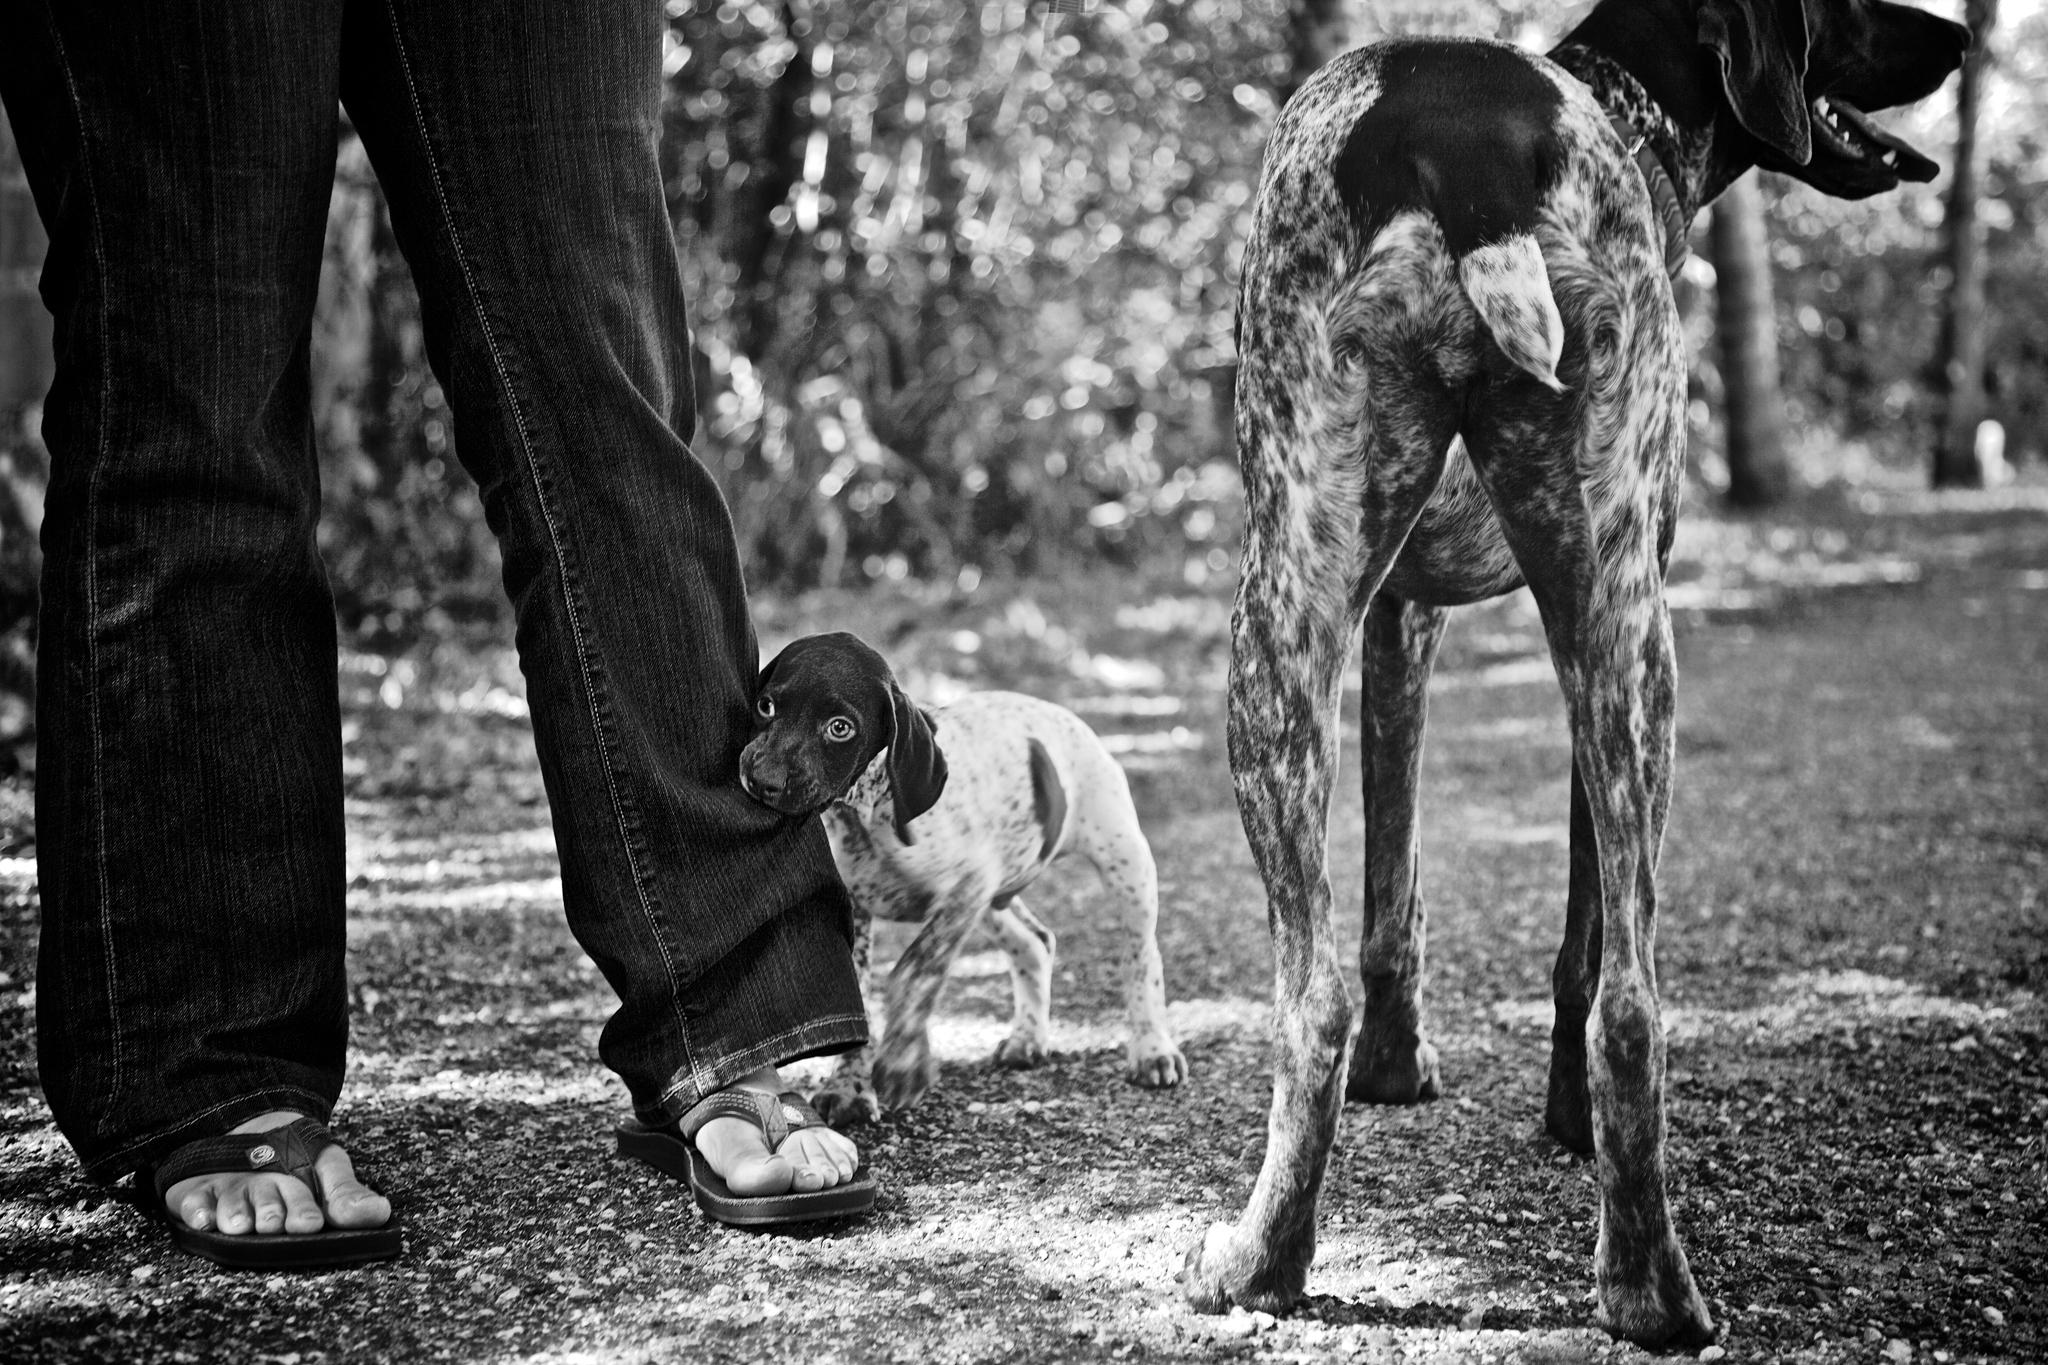 boprey-pet-photography-portrait-nyc_11.jpg